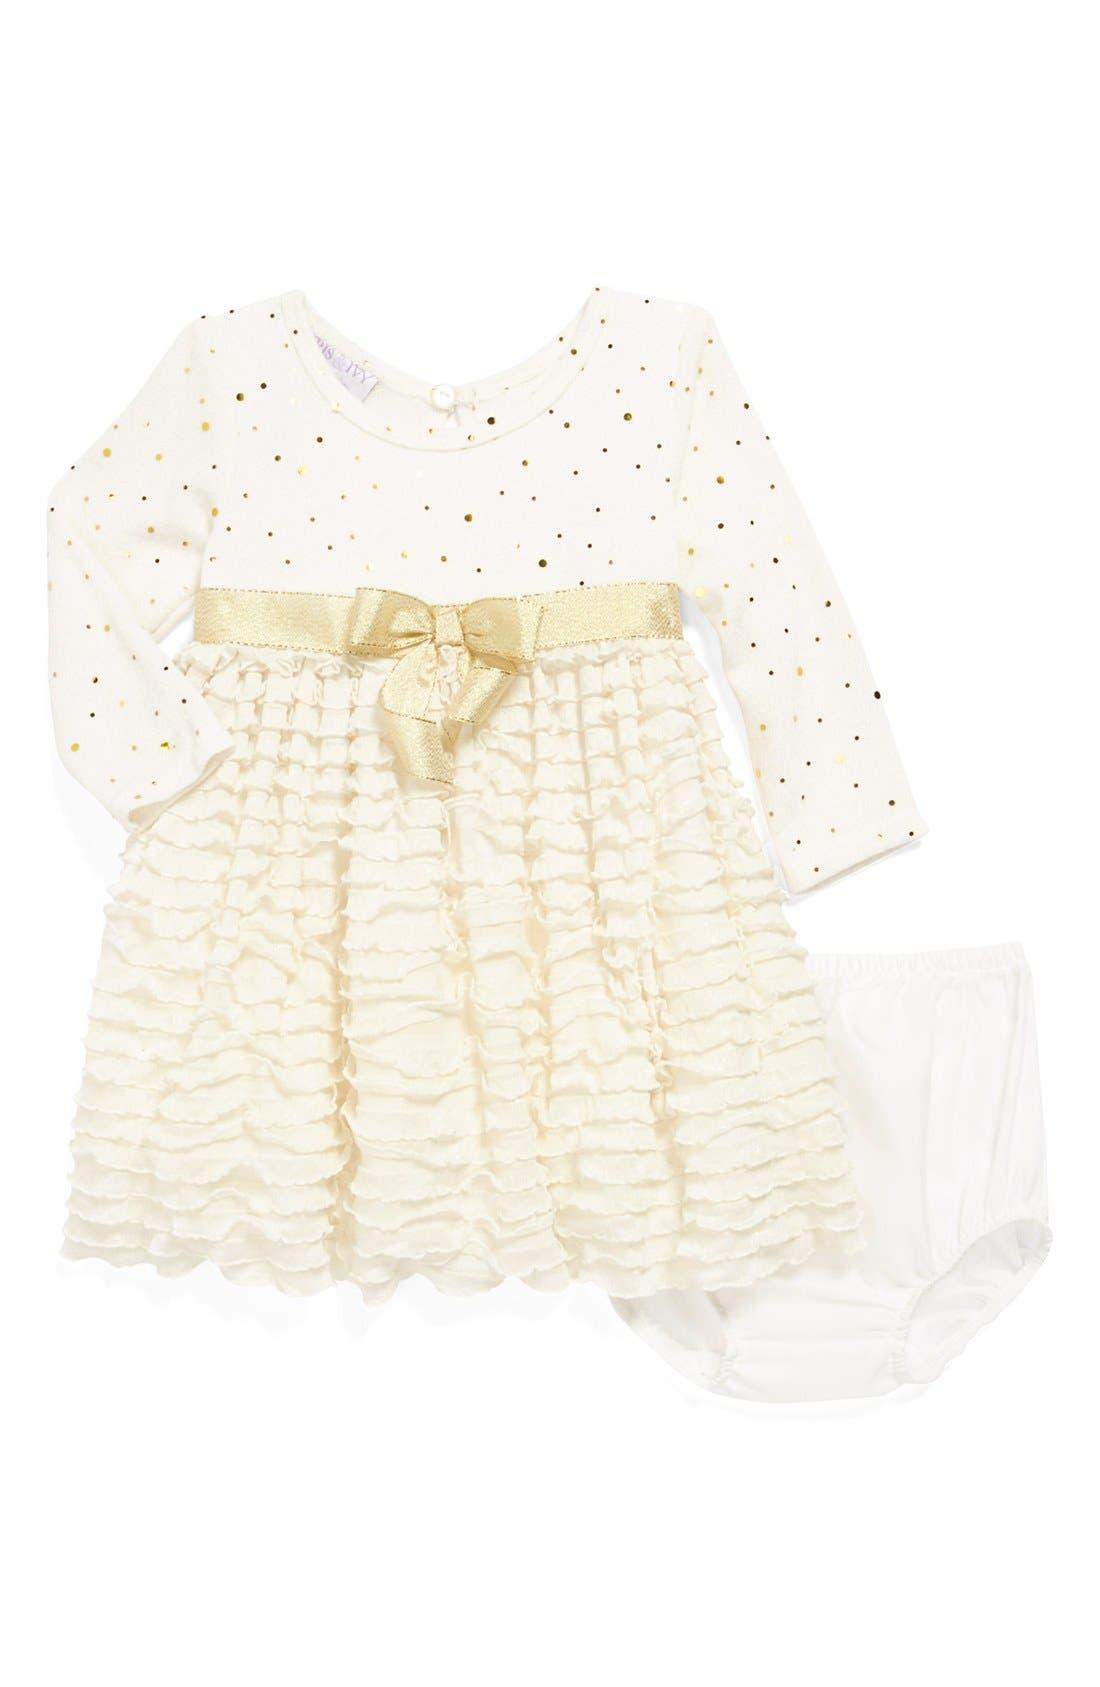 Main Image - Iris & Ivy Glitter Knit Ruffle Skirt Dress (Baby Girls)